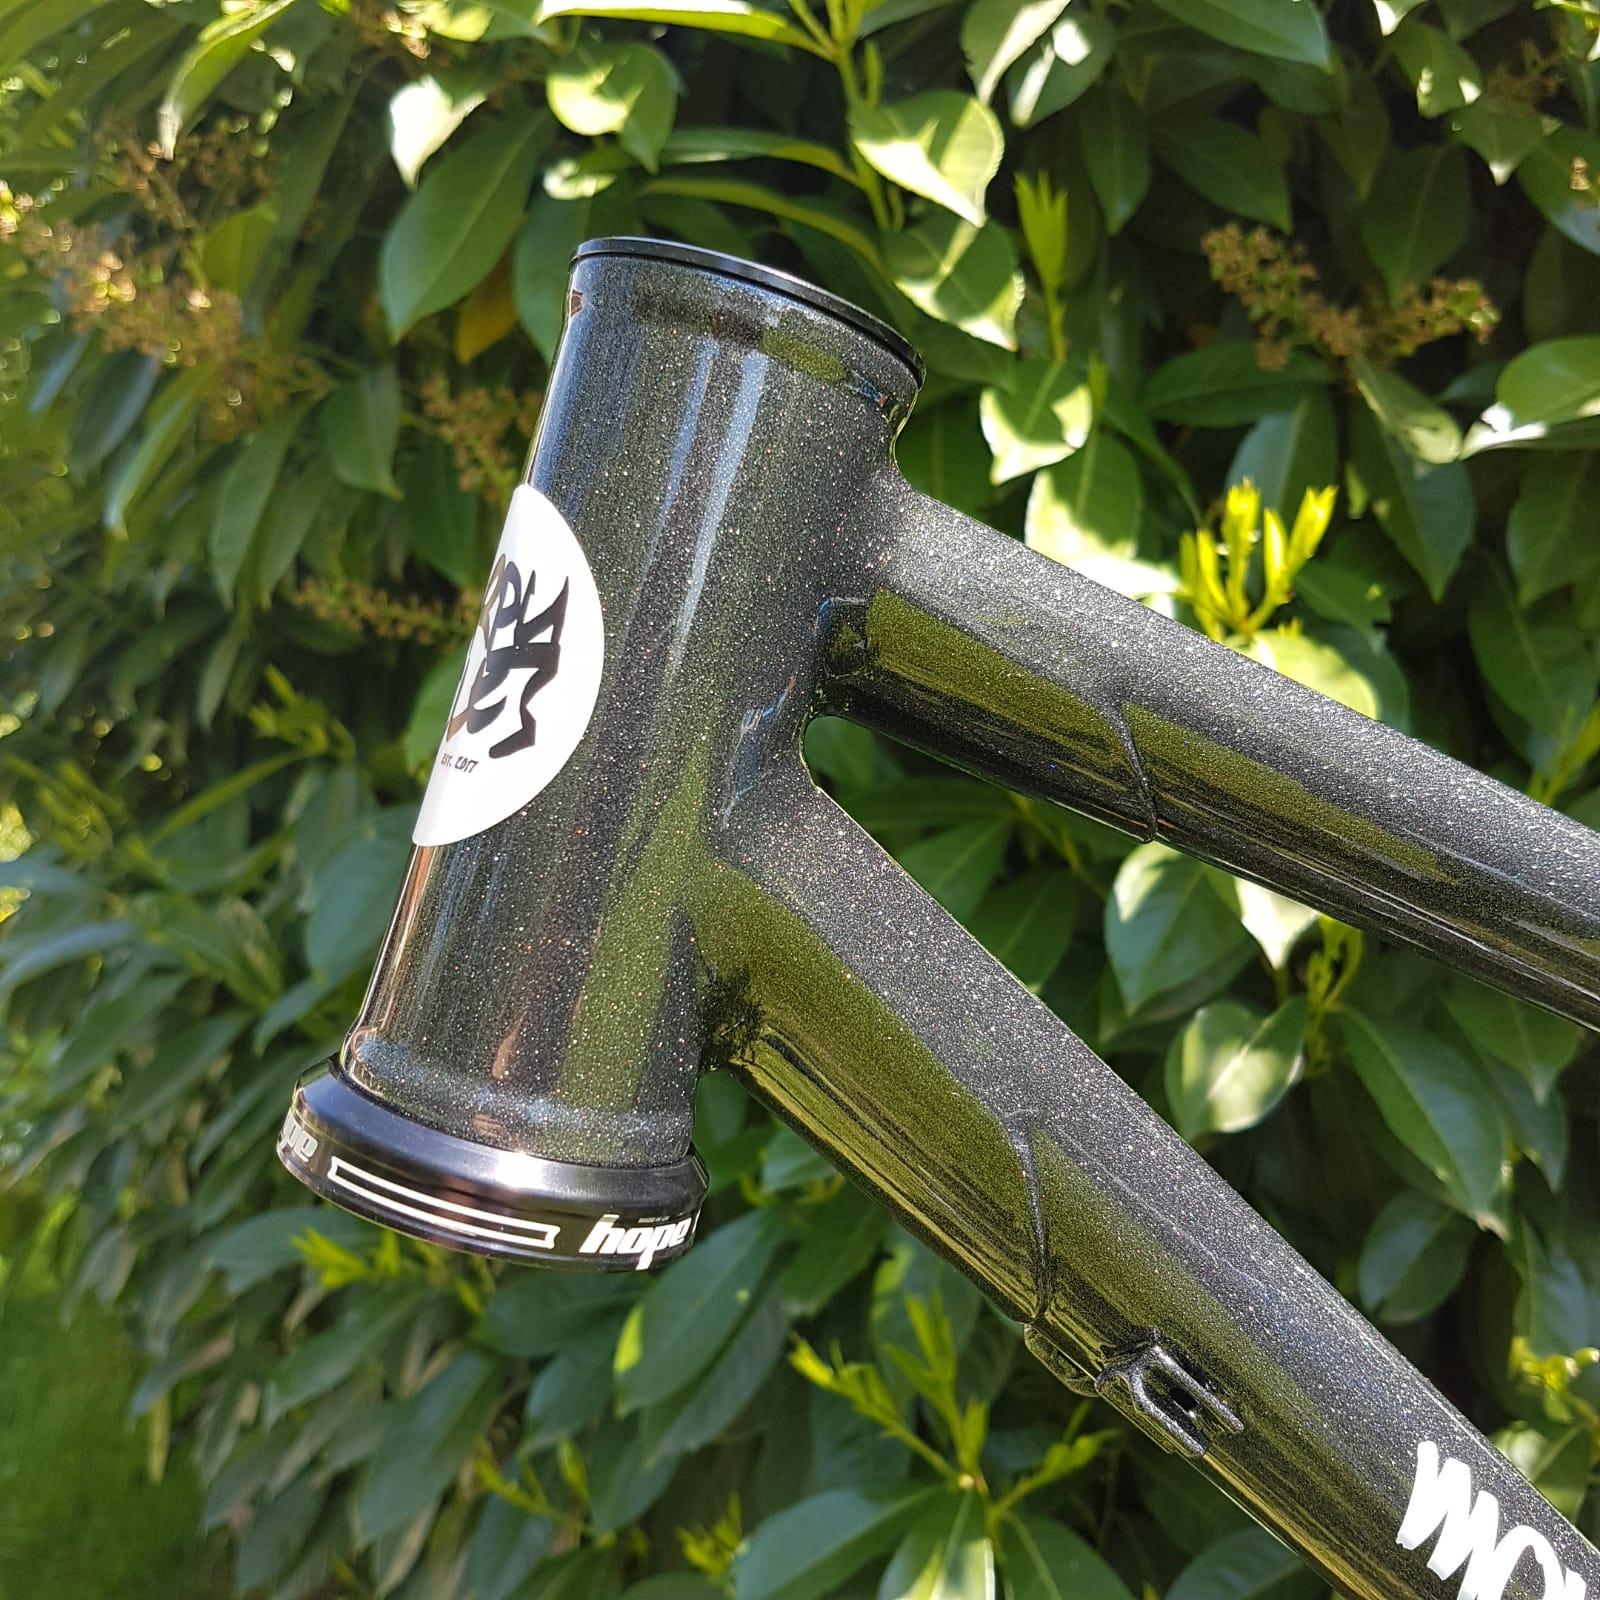 Baudou_bikes_tout_suspendu_douille_fini2